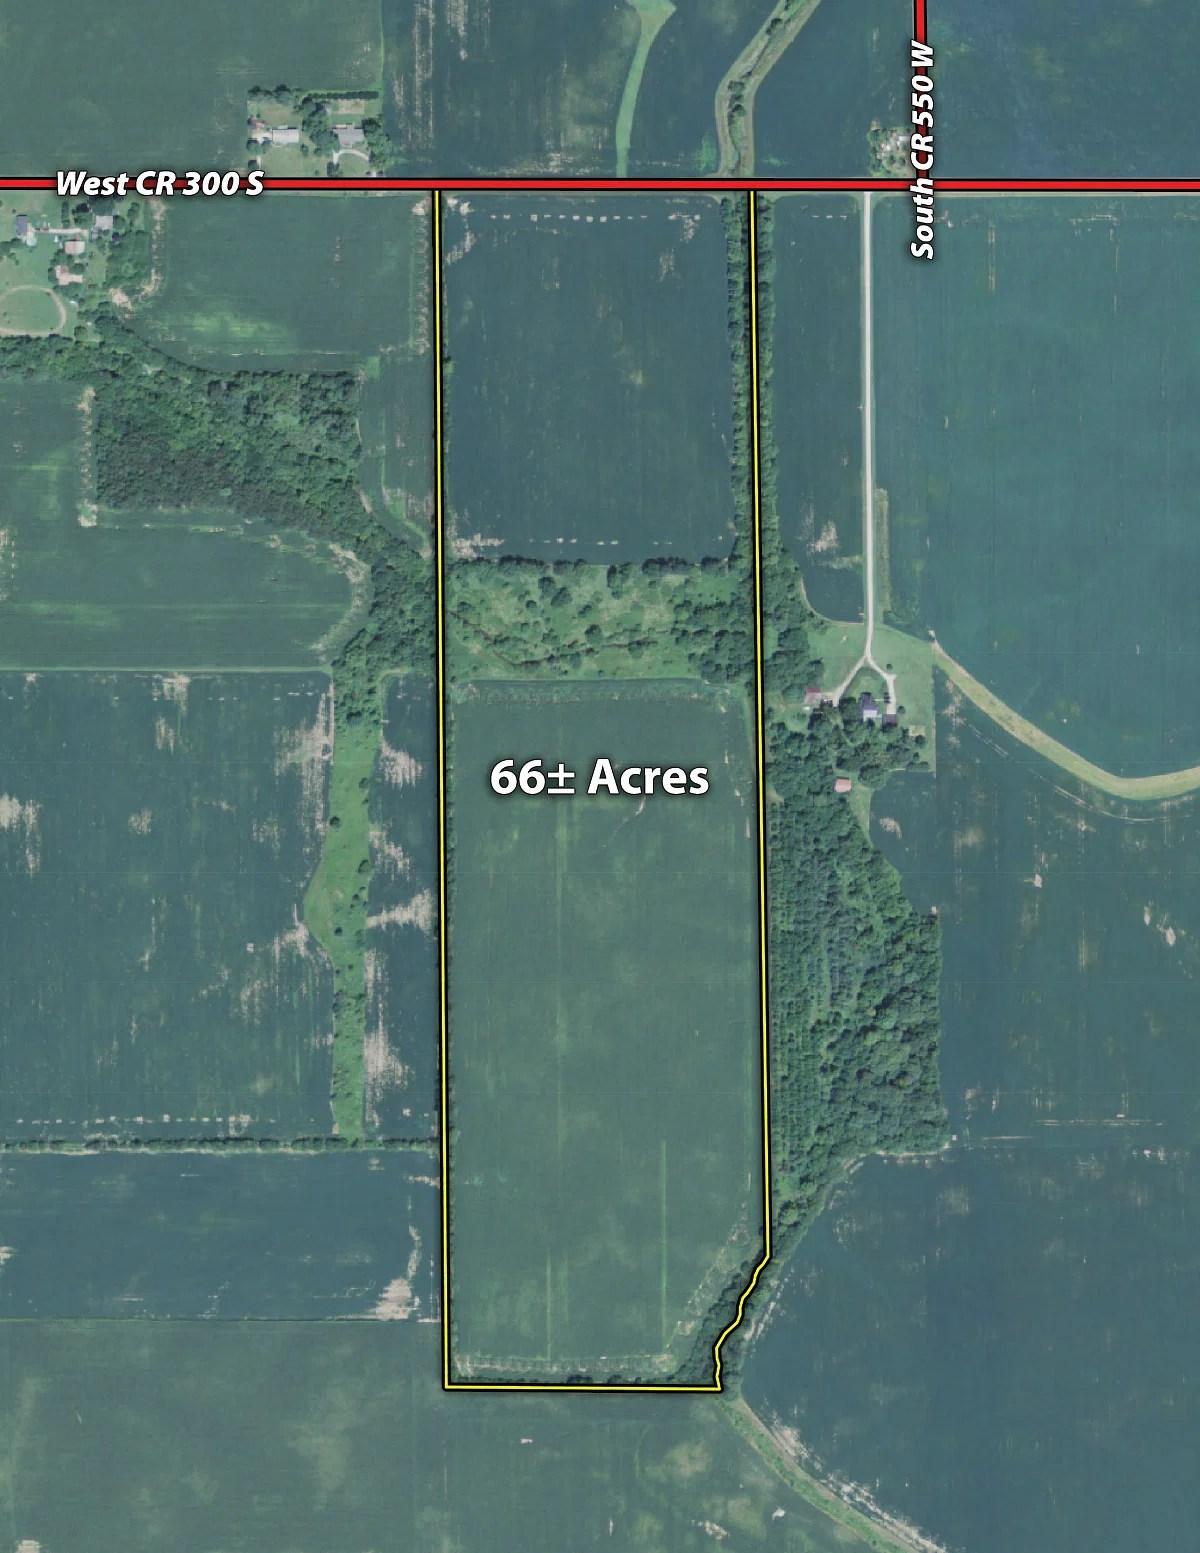 Land Survey Plat